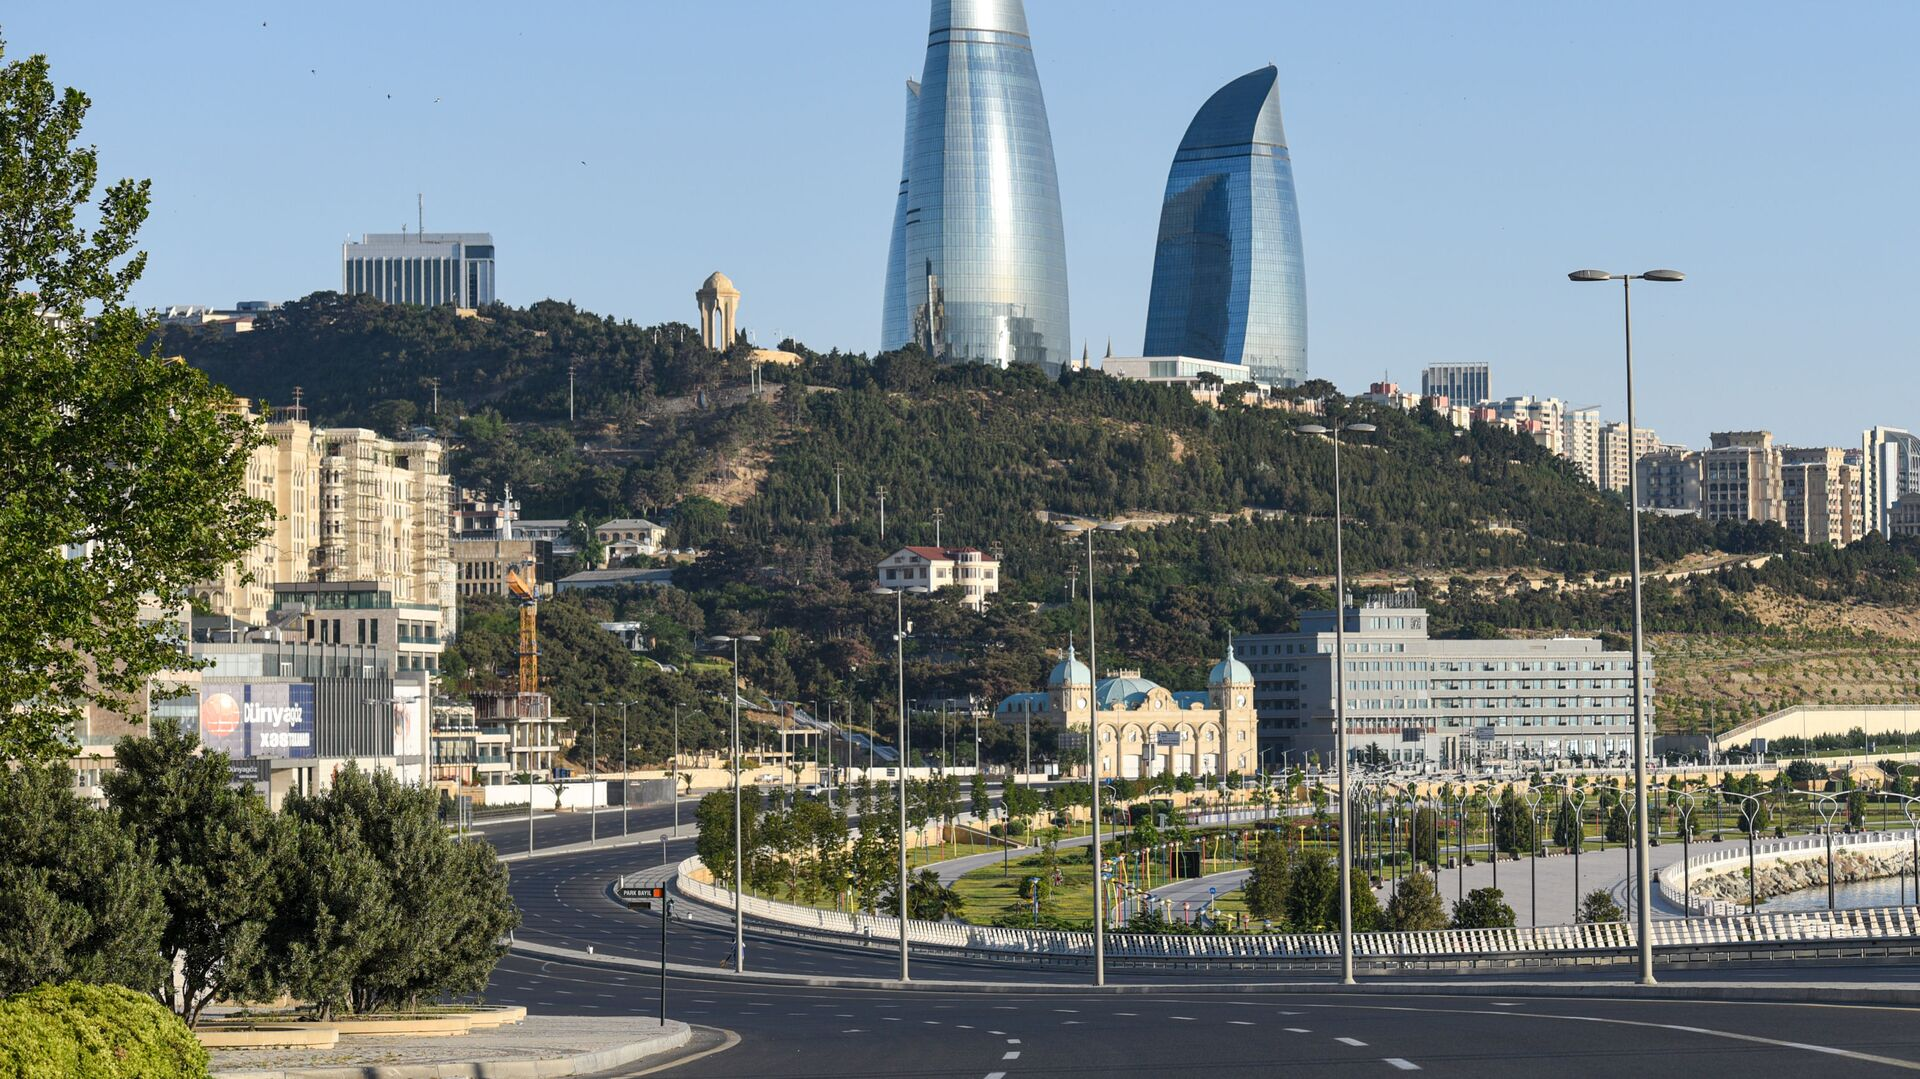 Вид на Баку, фото из архива - Sputnik Азербайджан, 1920, 15.04.2021